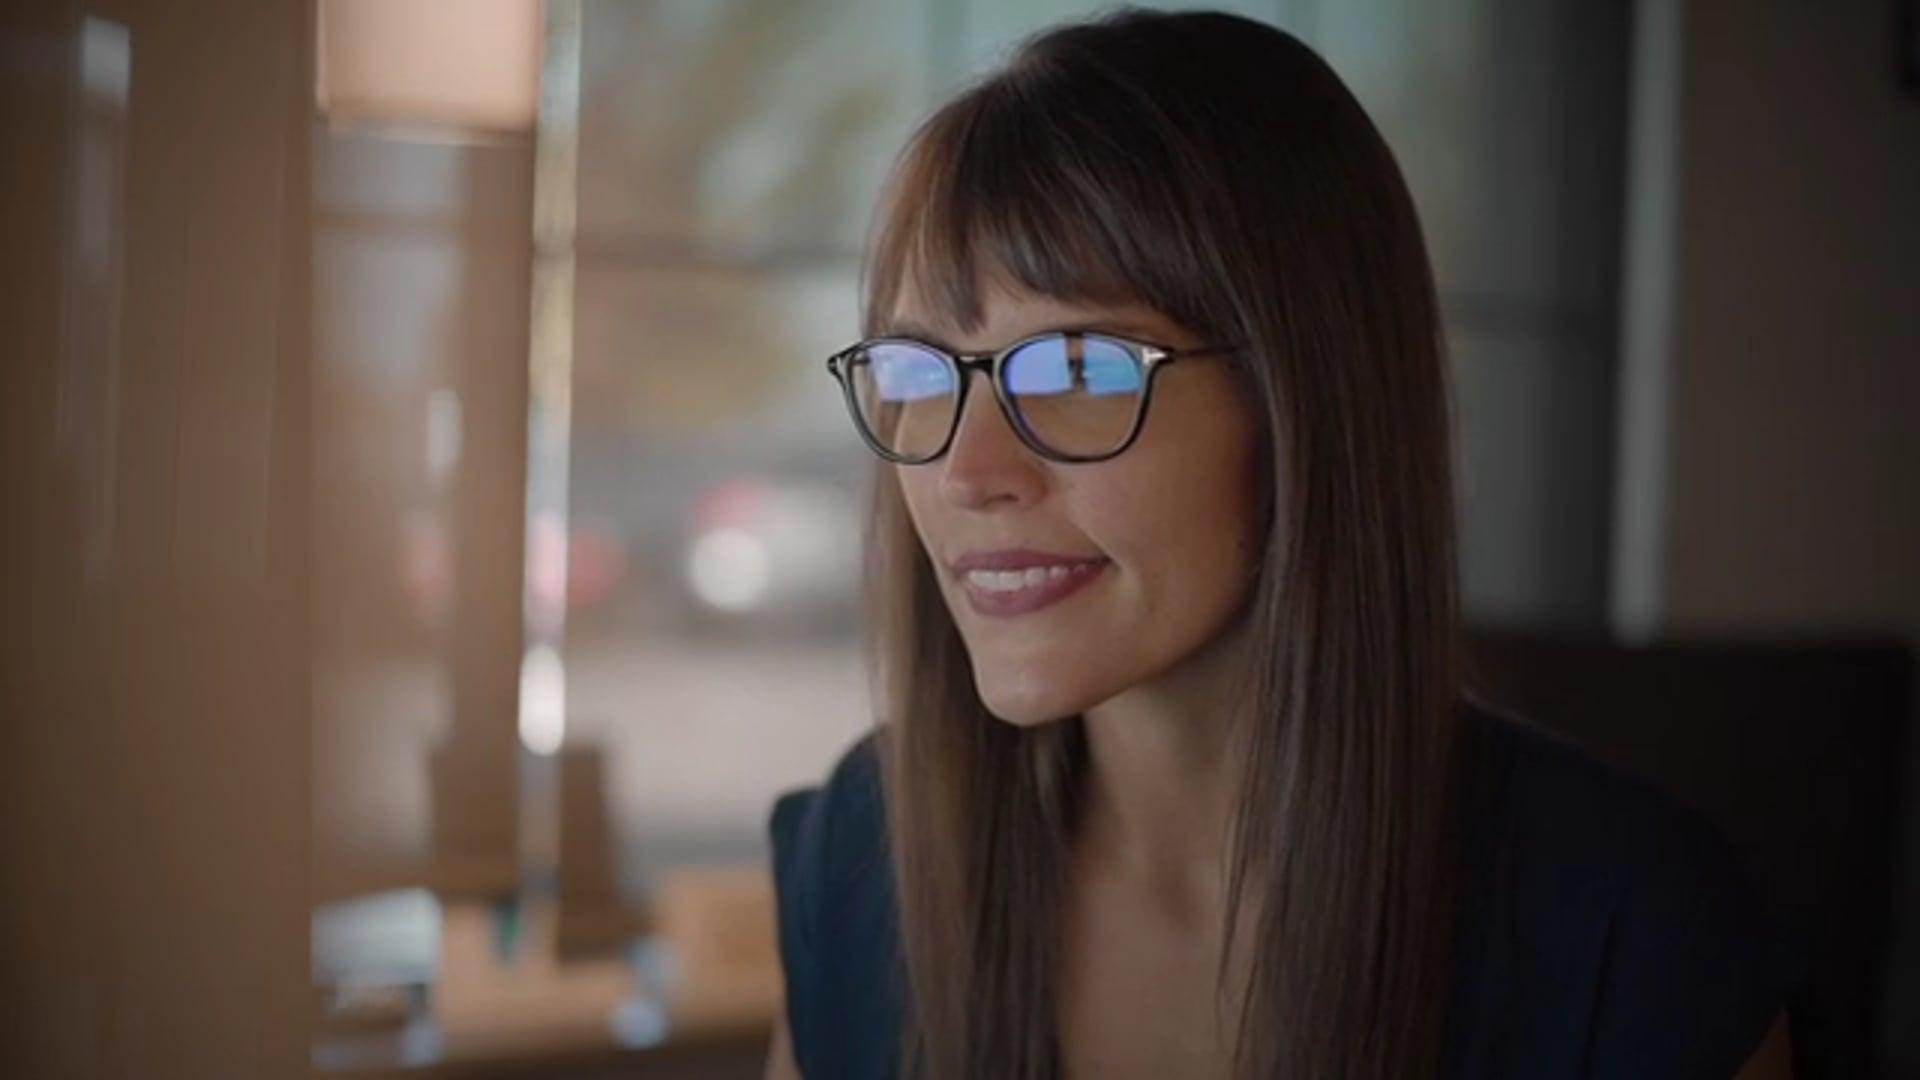 Vision Clinic - Blue Light Glasses